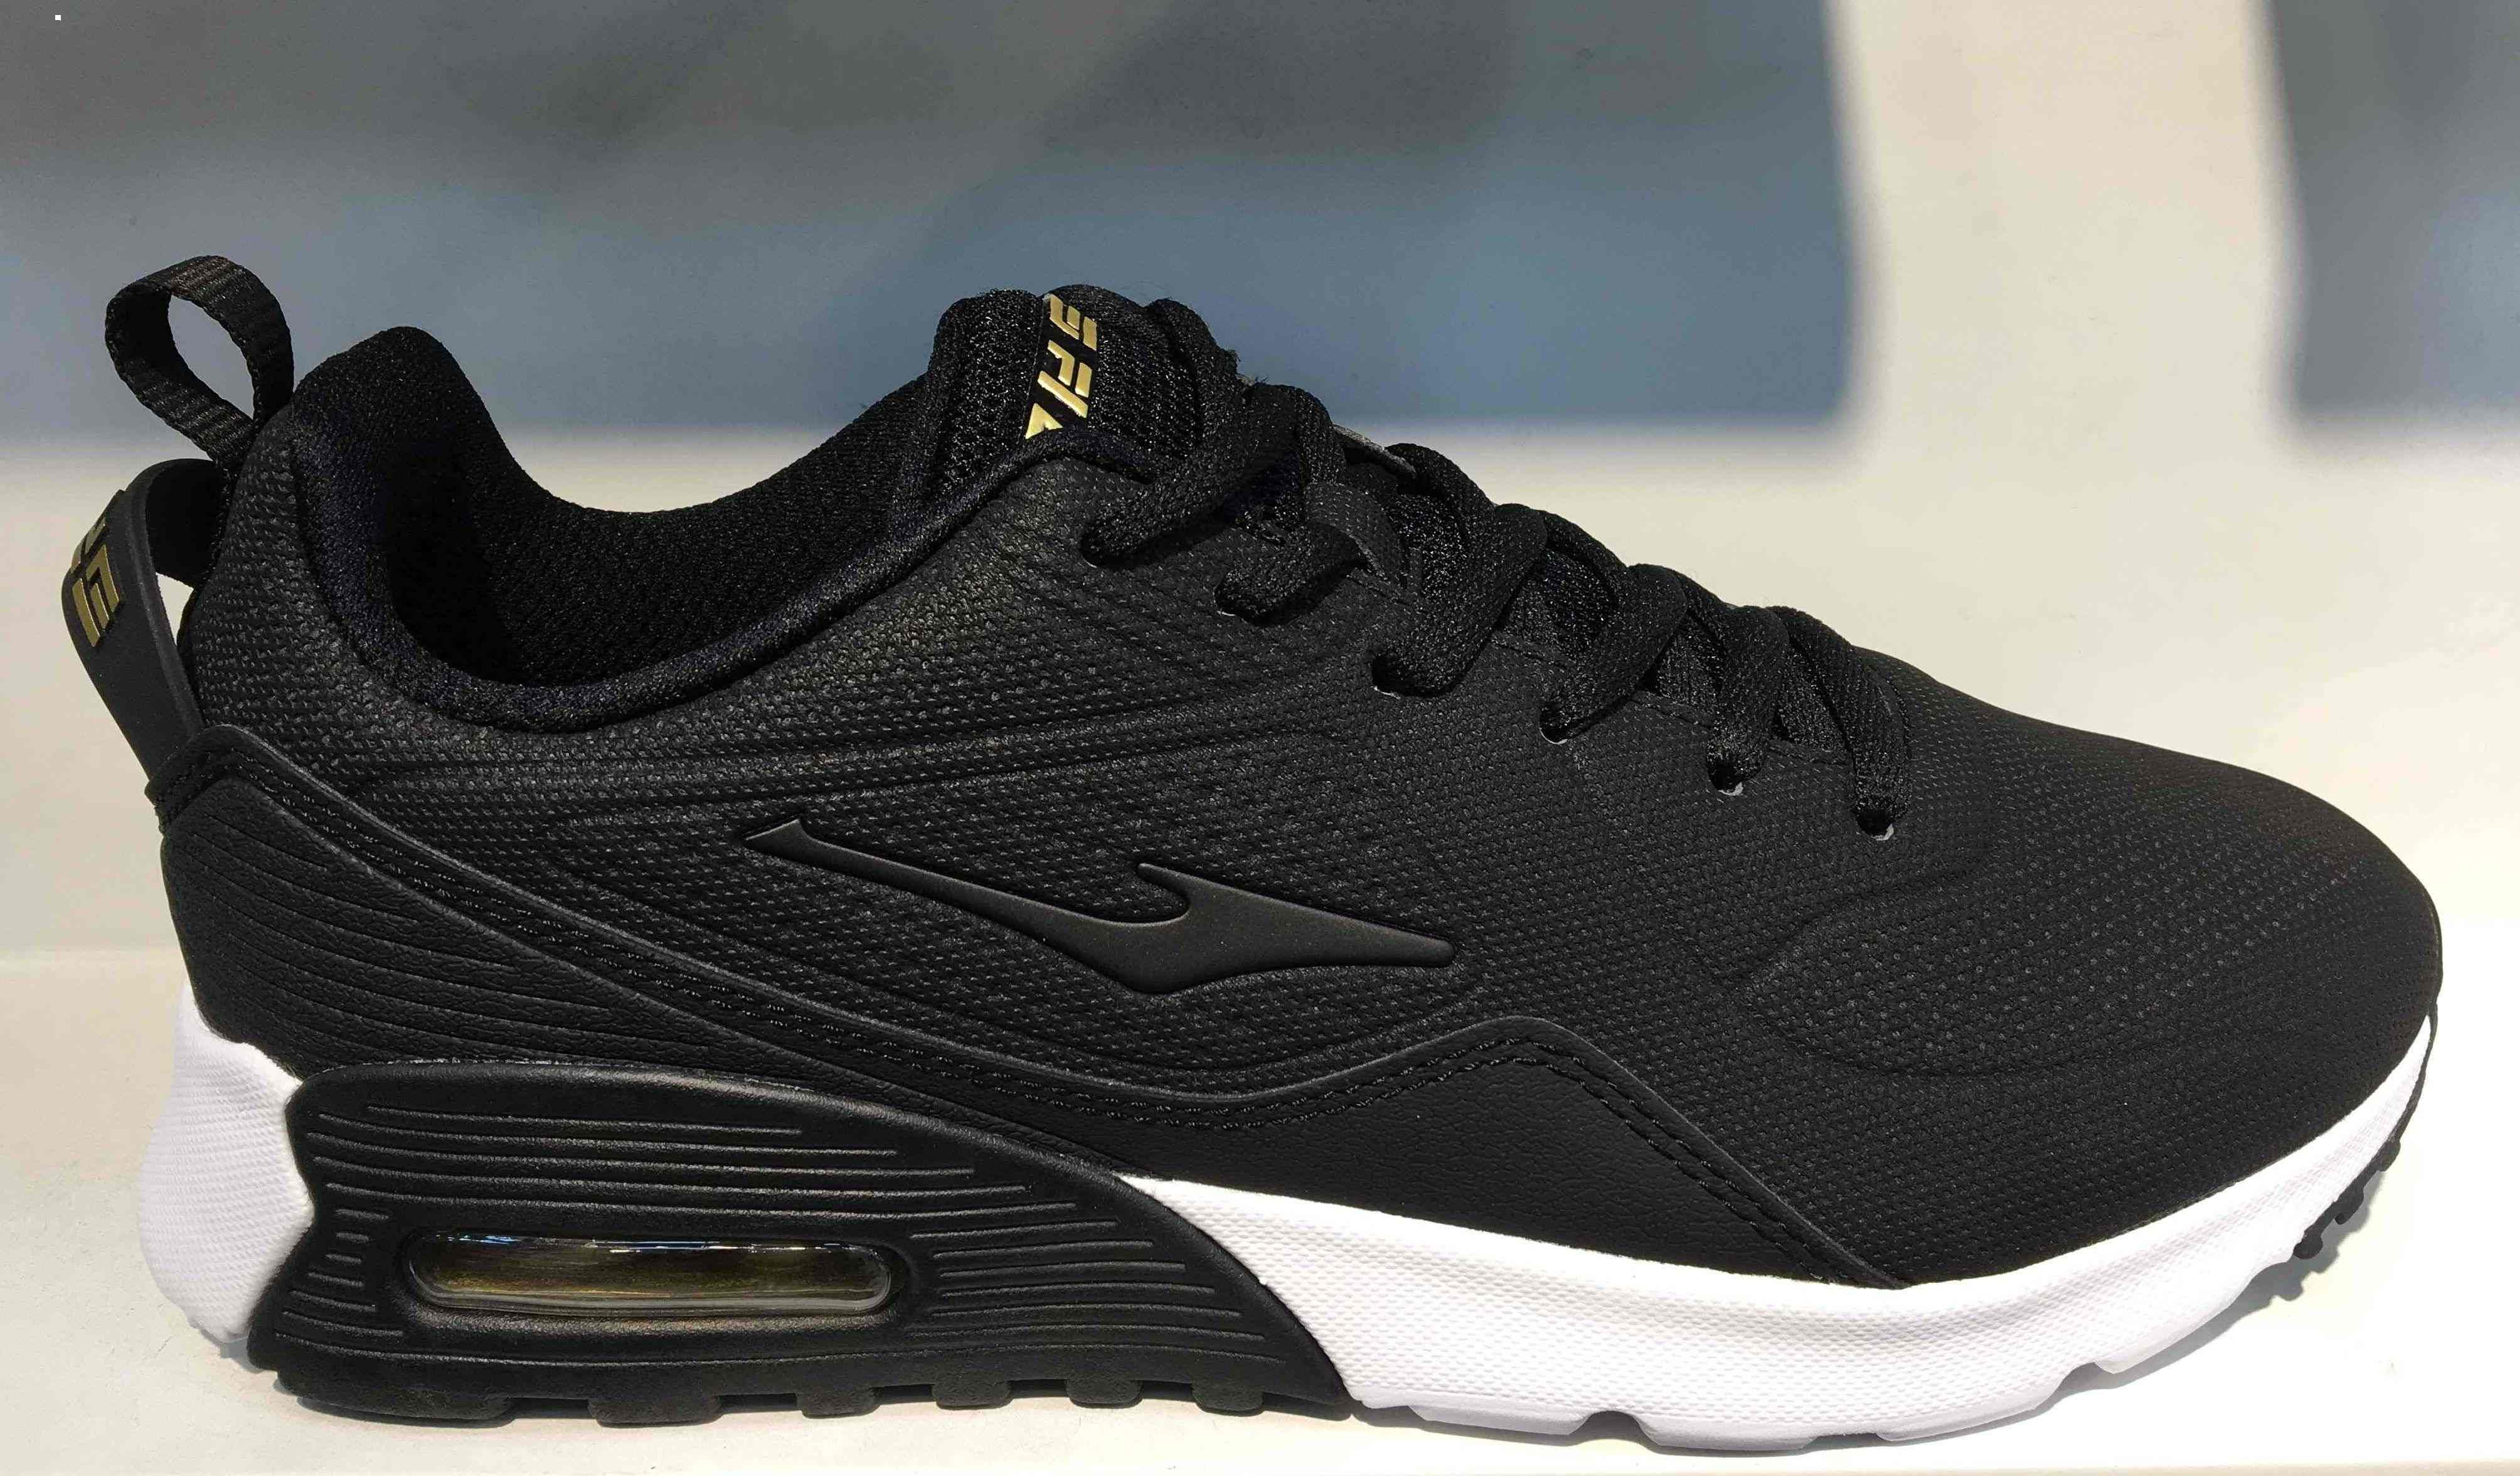 ERKE Cushioning Running Shoes for Men 11119420159-004